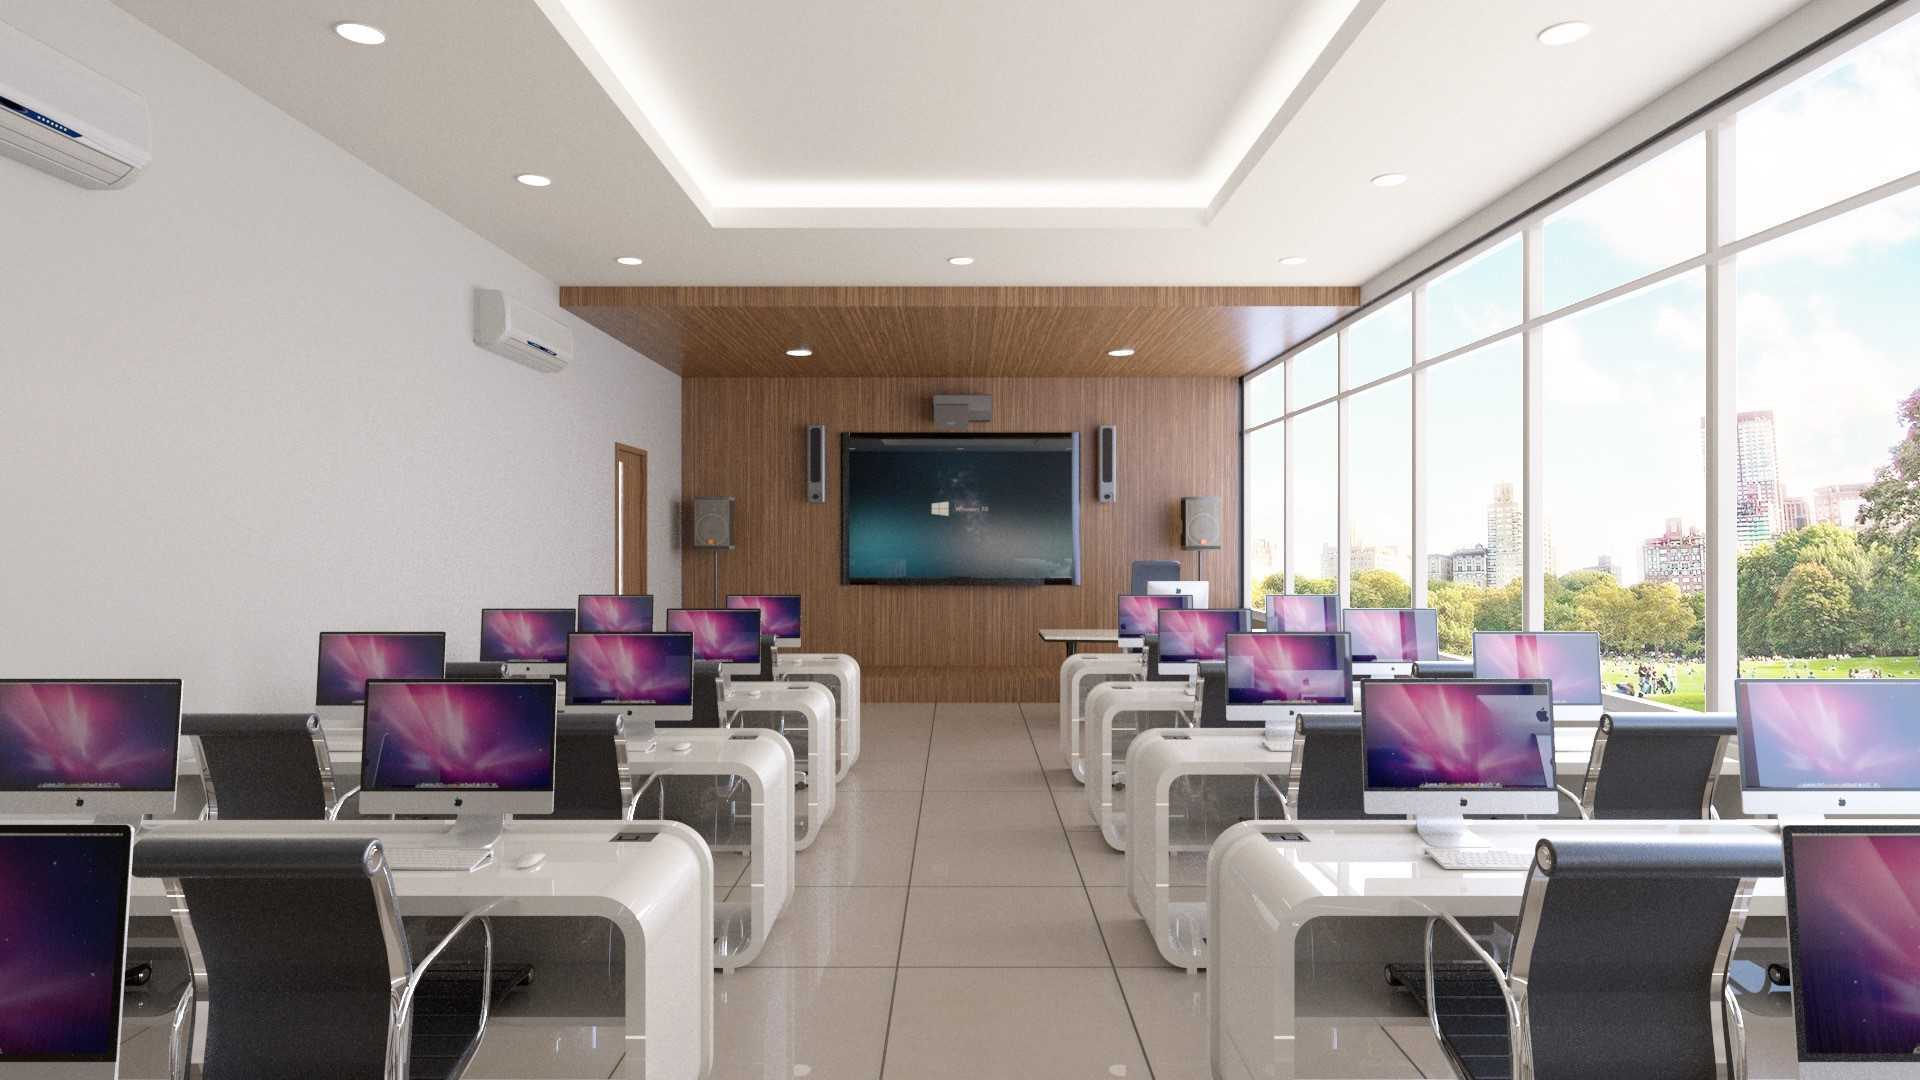 Studio 1024 Smart Classroom Jakarta Timur, Kota Jakarta Timur, Daerah Khusus Ibukota Jakarta, Indonesia Jakarta Timur, Kota Jakarta Timur, Daerah Khusus Ibukota Jakarta, Indonesia Studio-1024-Smart-Classroom  111168